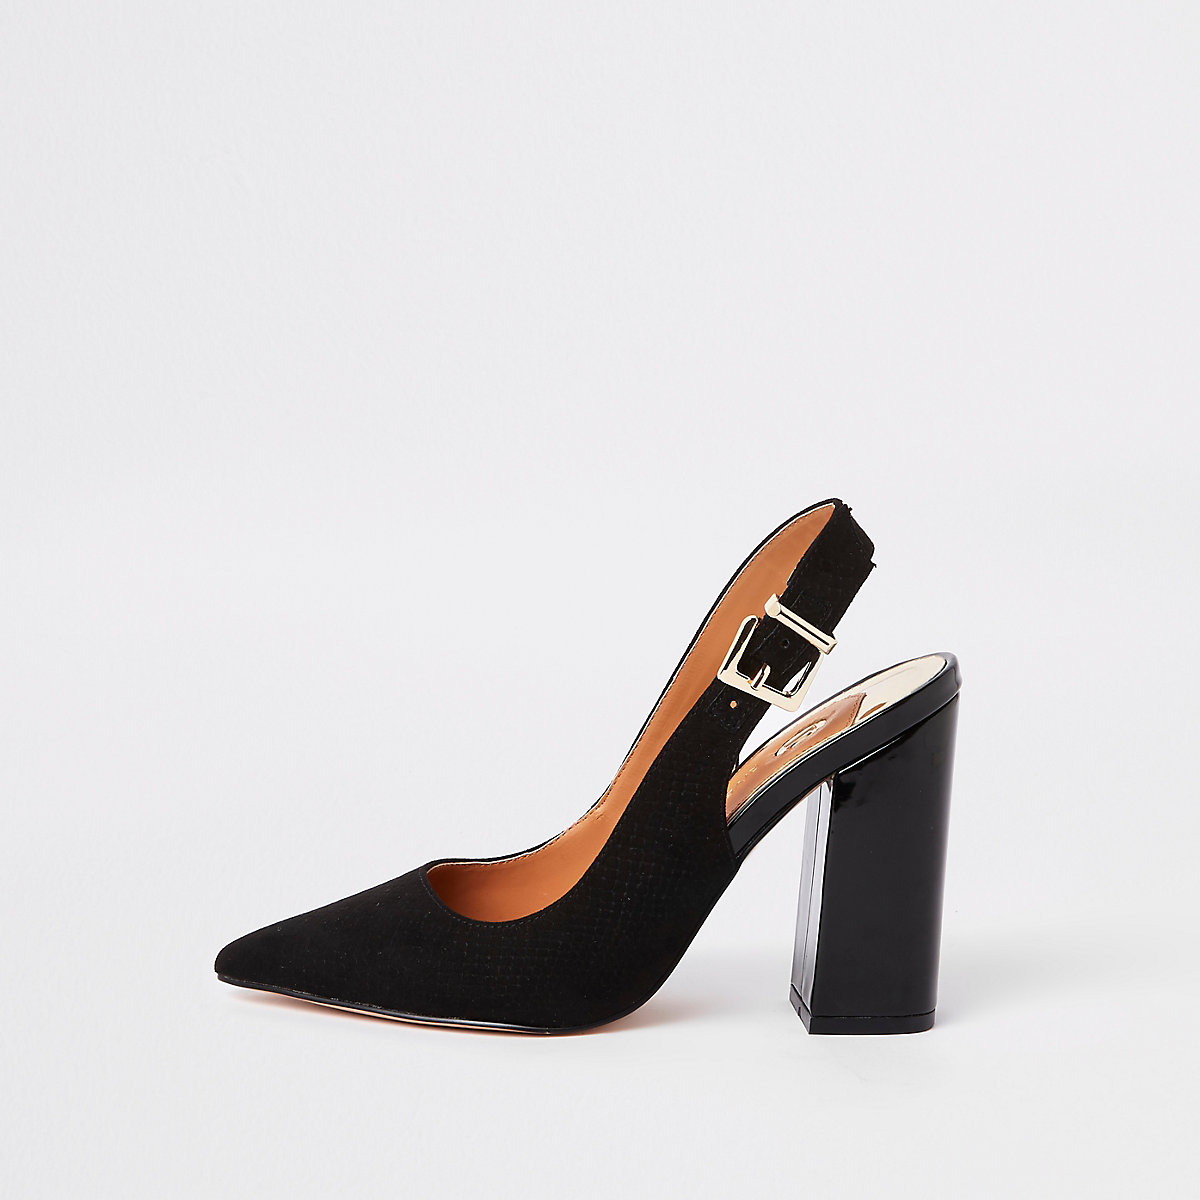 Black block heel slingback court shoes